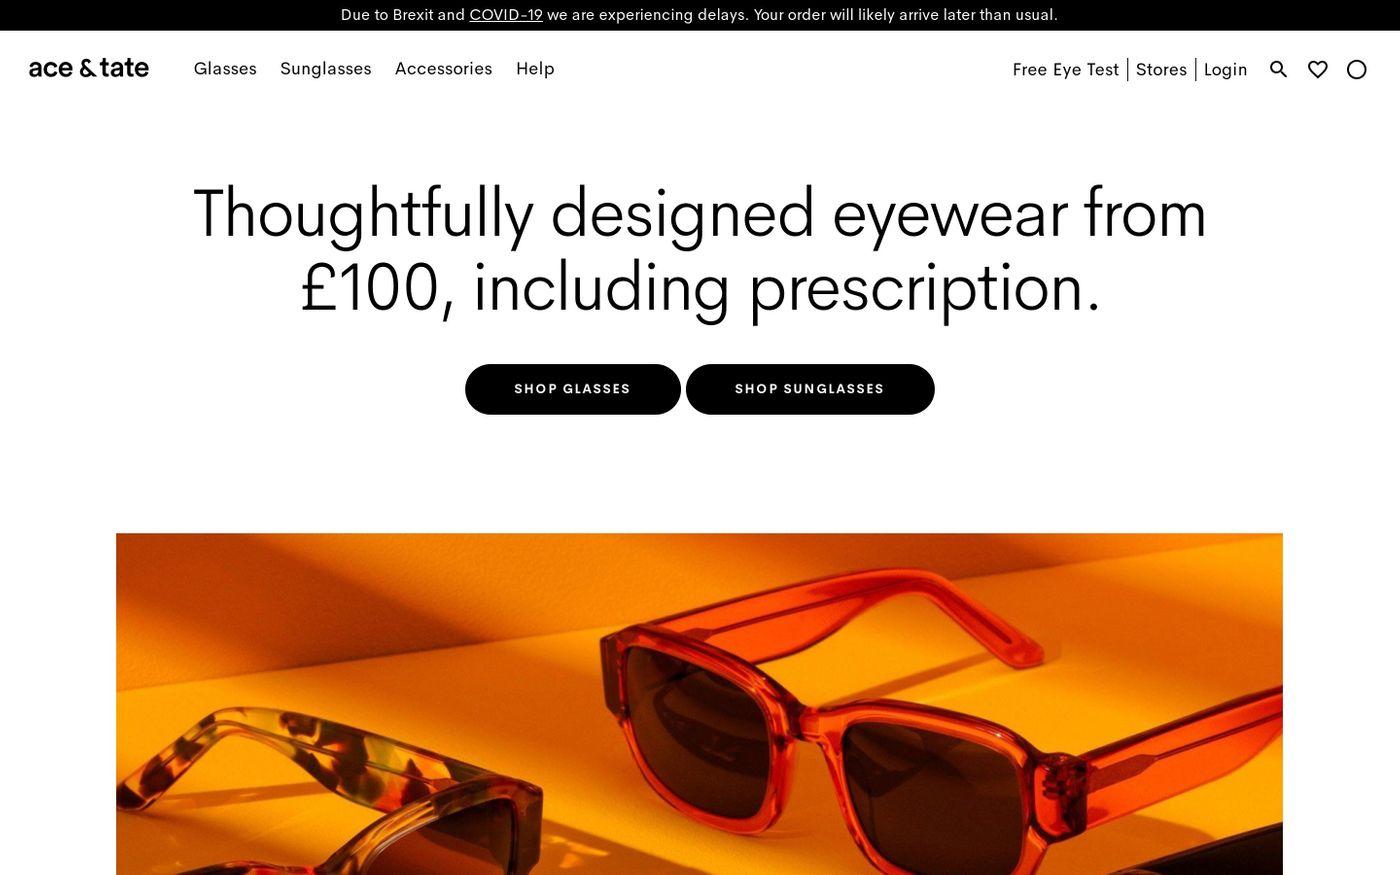 Screenshot of Ace & Tate website